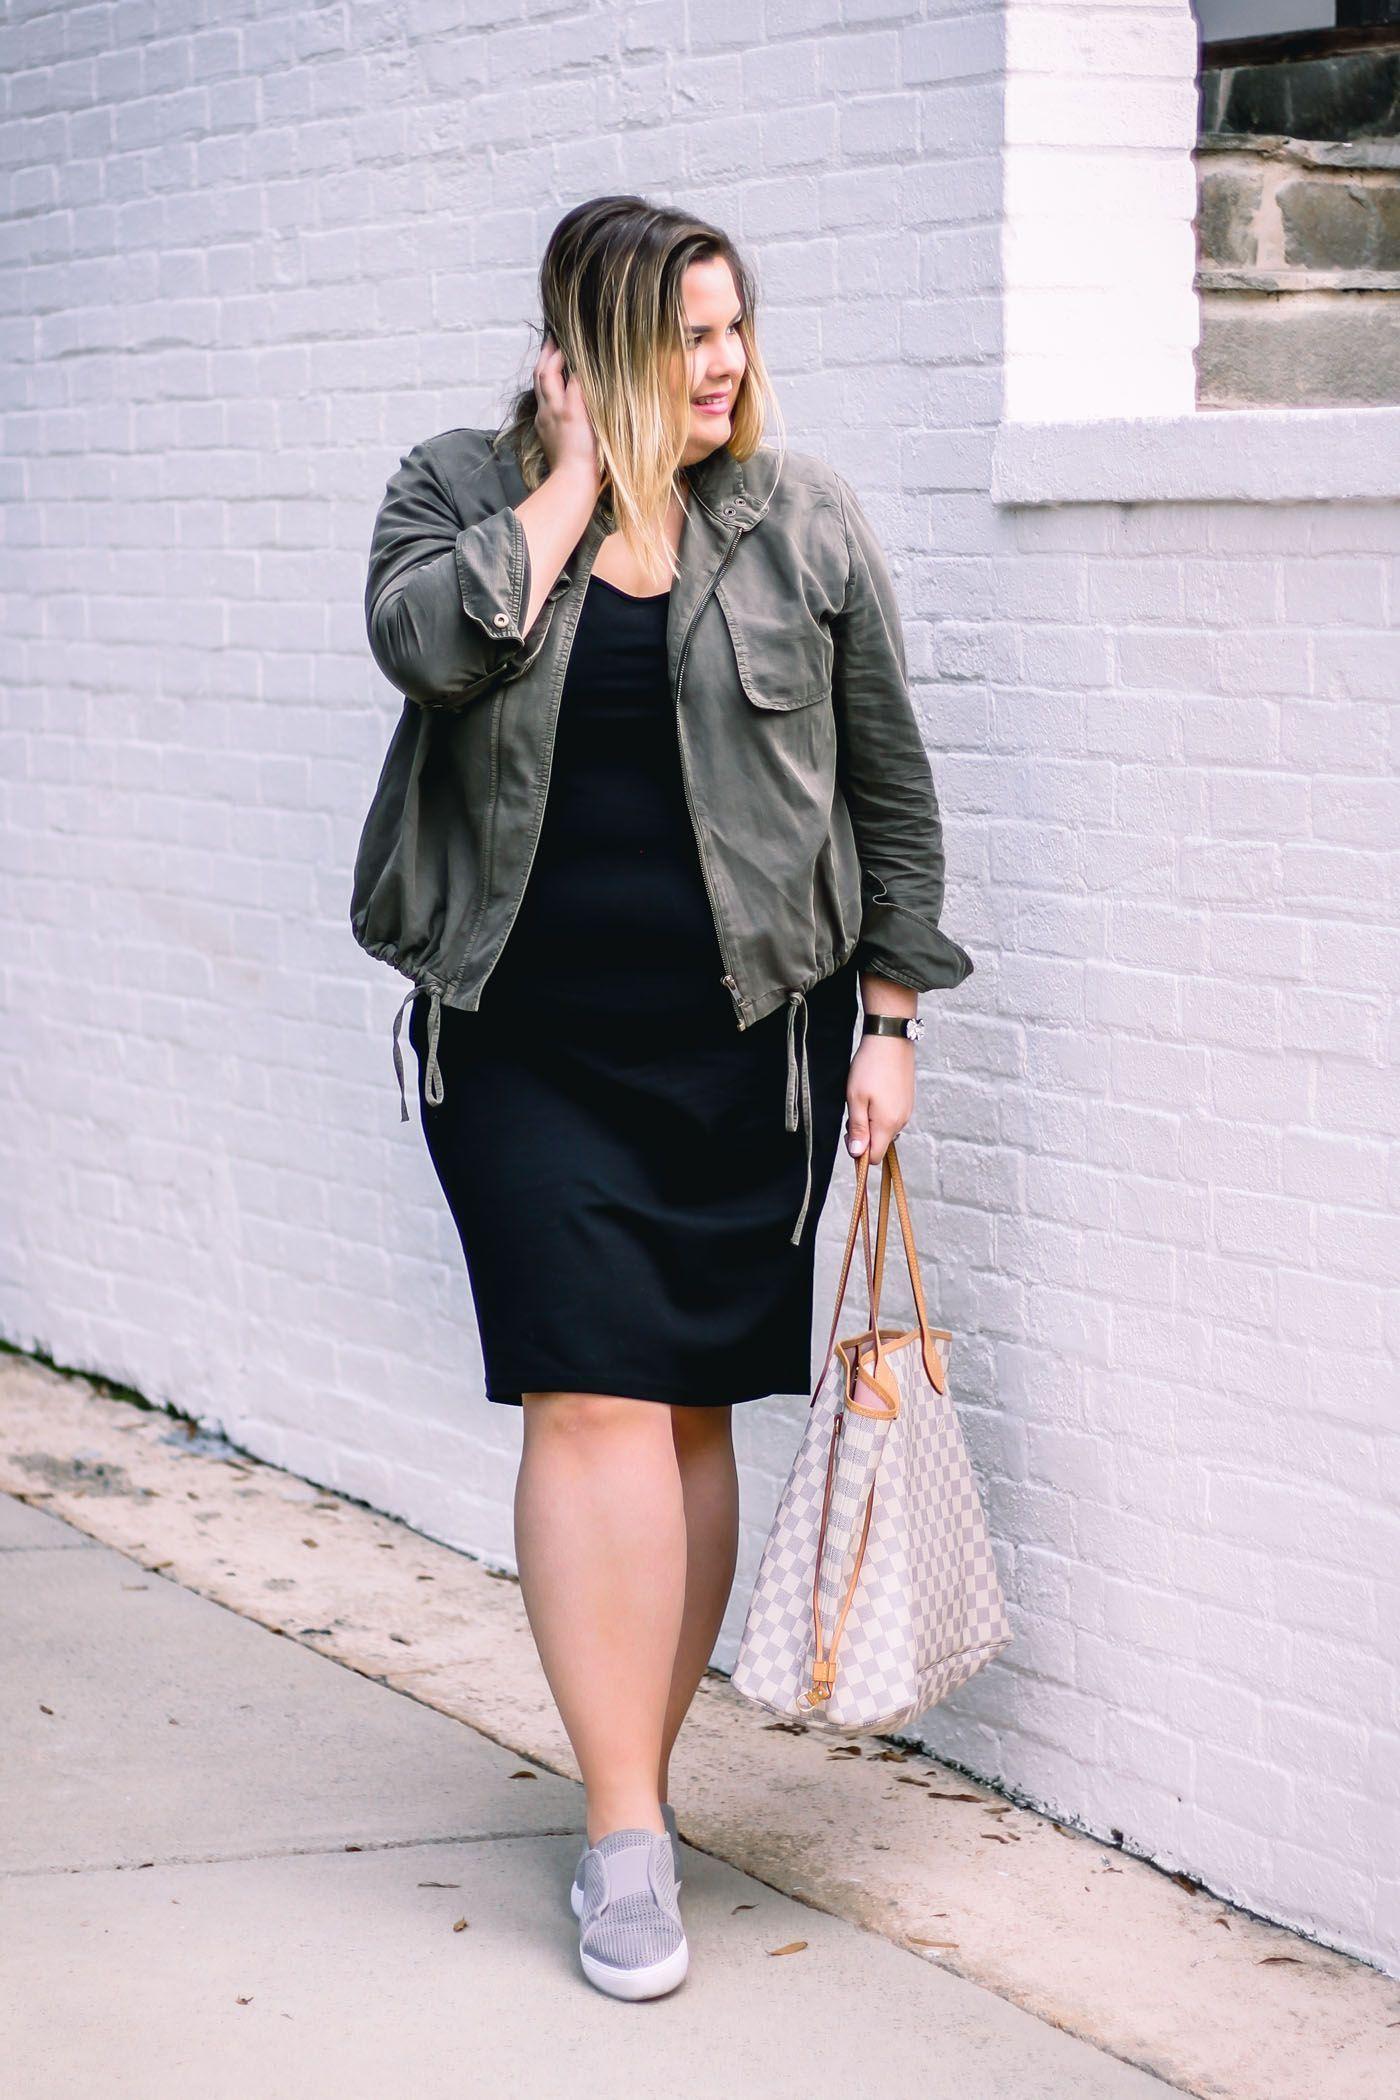 746d0a508da Plus Size Fashion for Women - Stylish Sassy   Classy